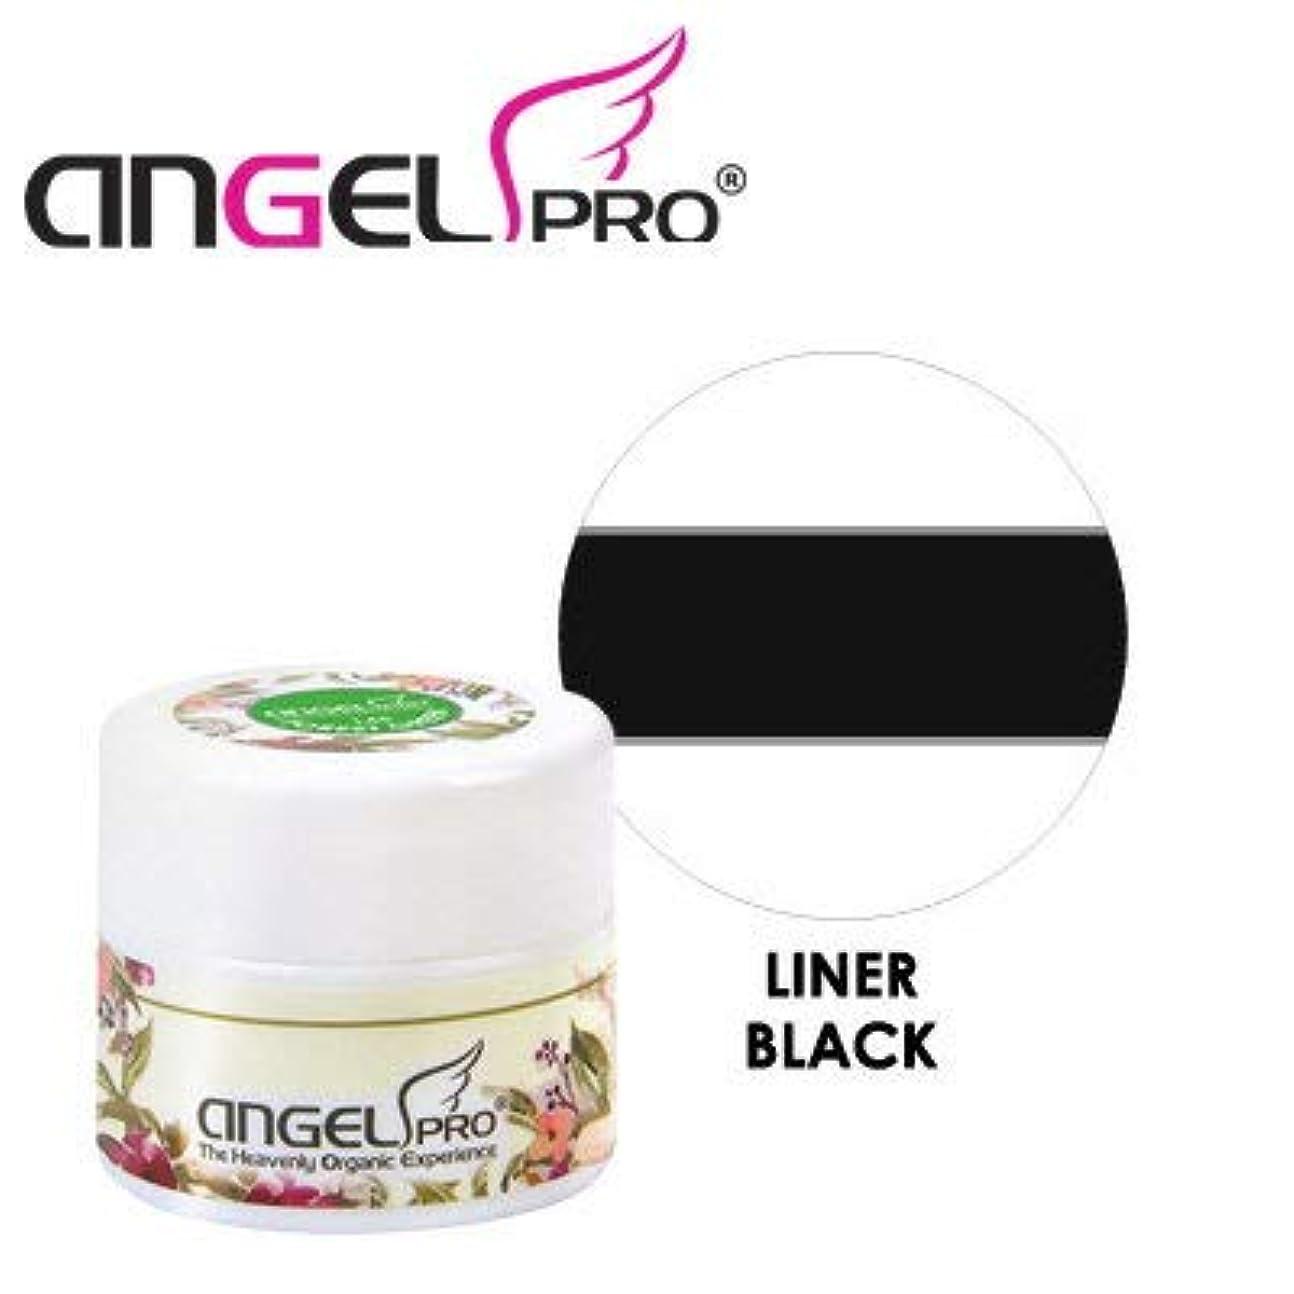 ANGEL PRO ポットジェリー LINER BLACK 4g